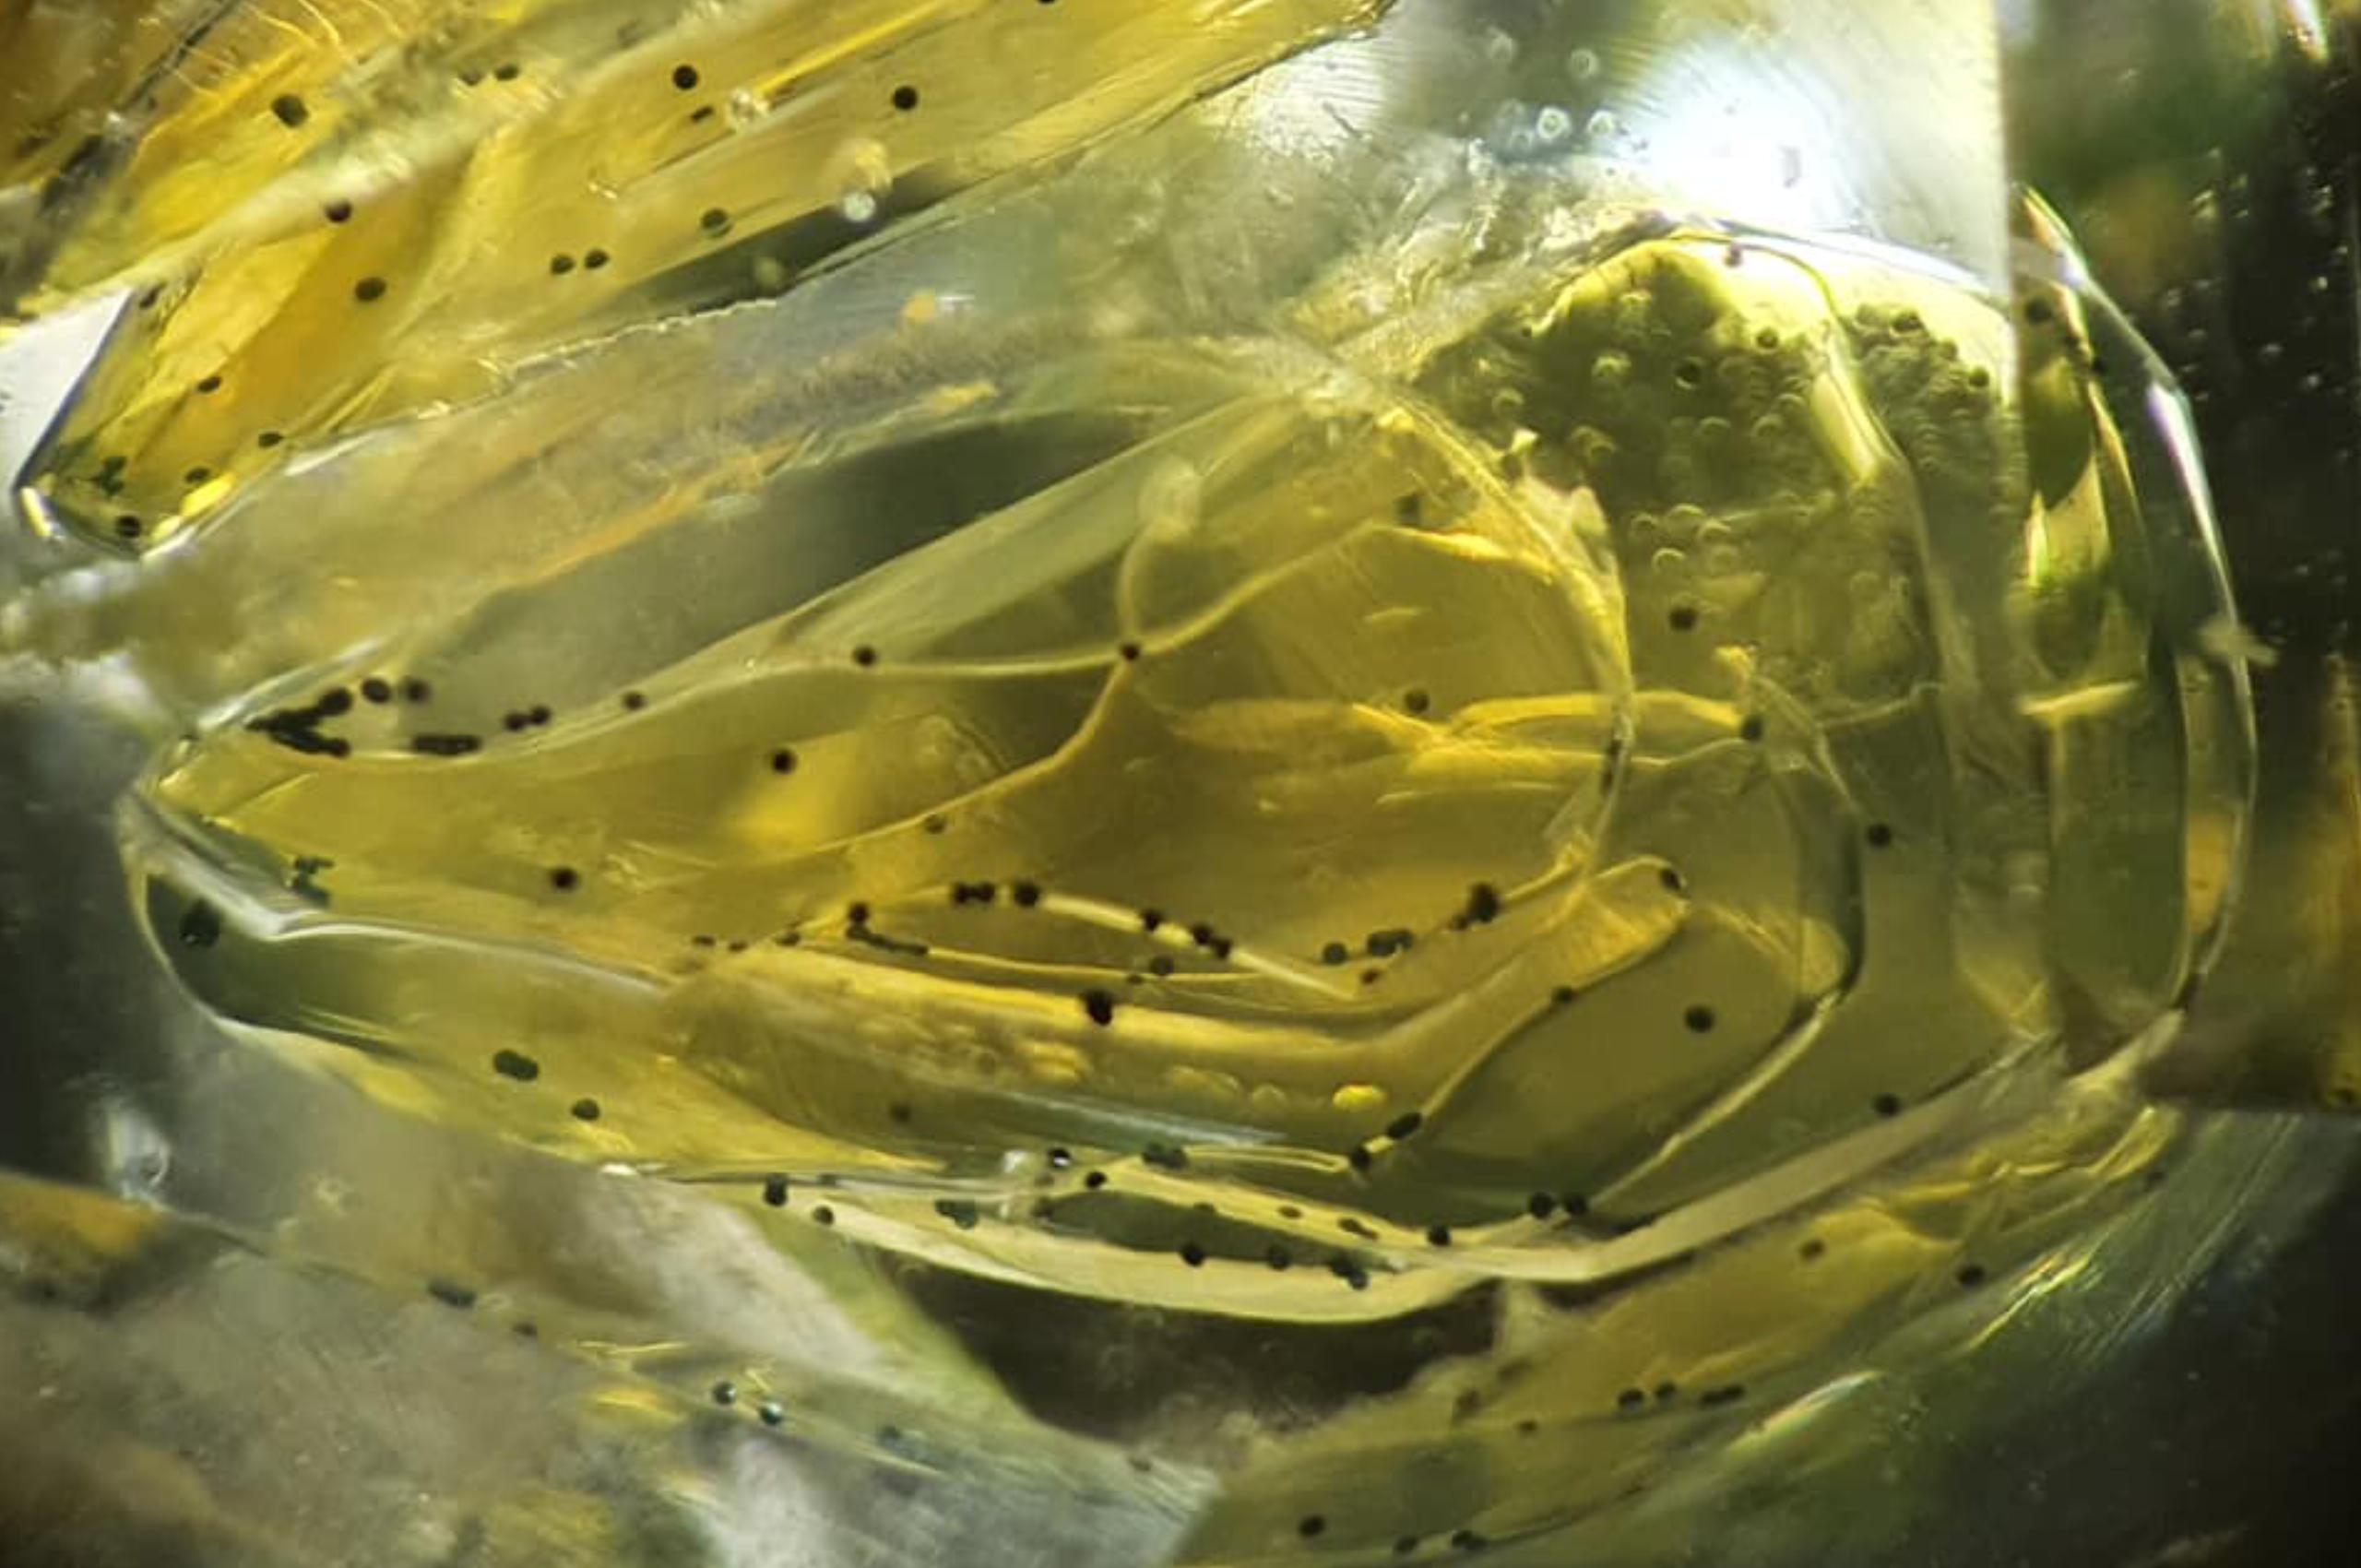 Petroleum and bitumen in Petroluem quartz. Photo by Gérald Deplus